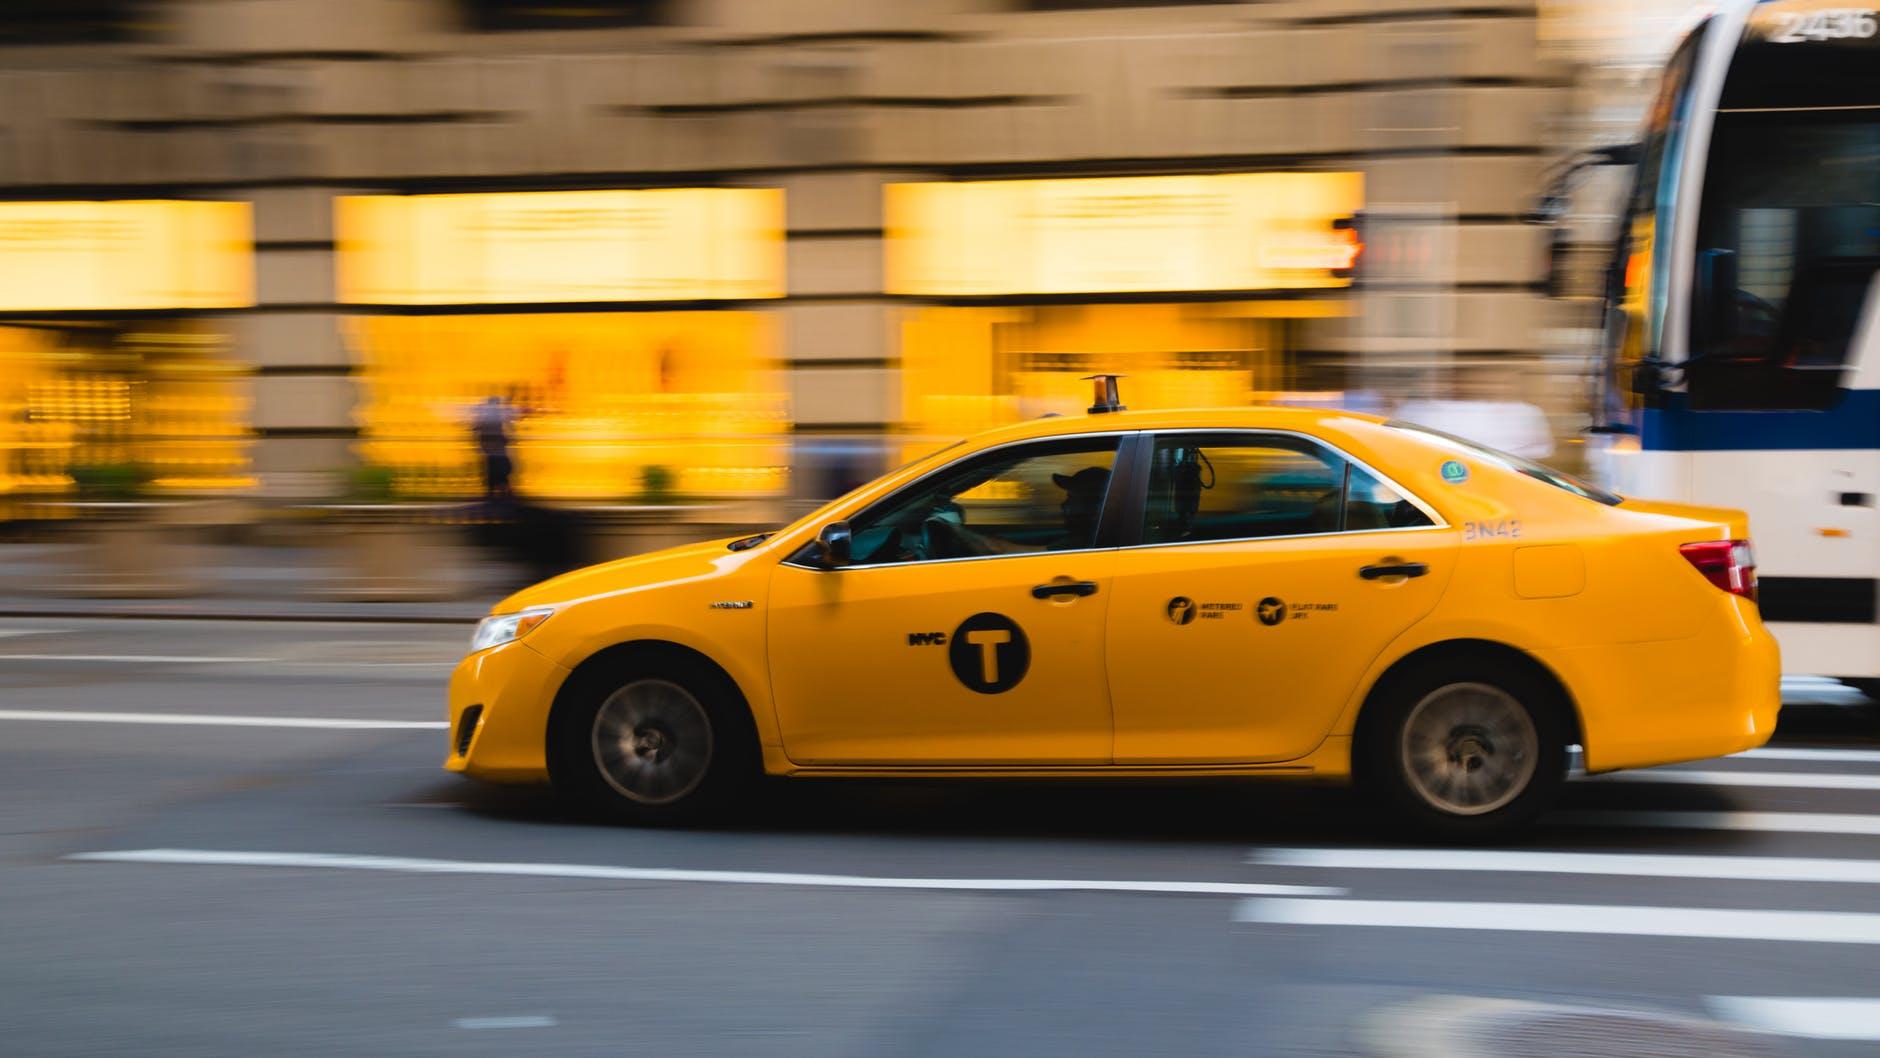 Заправка с баланса таксометра